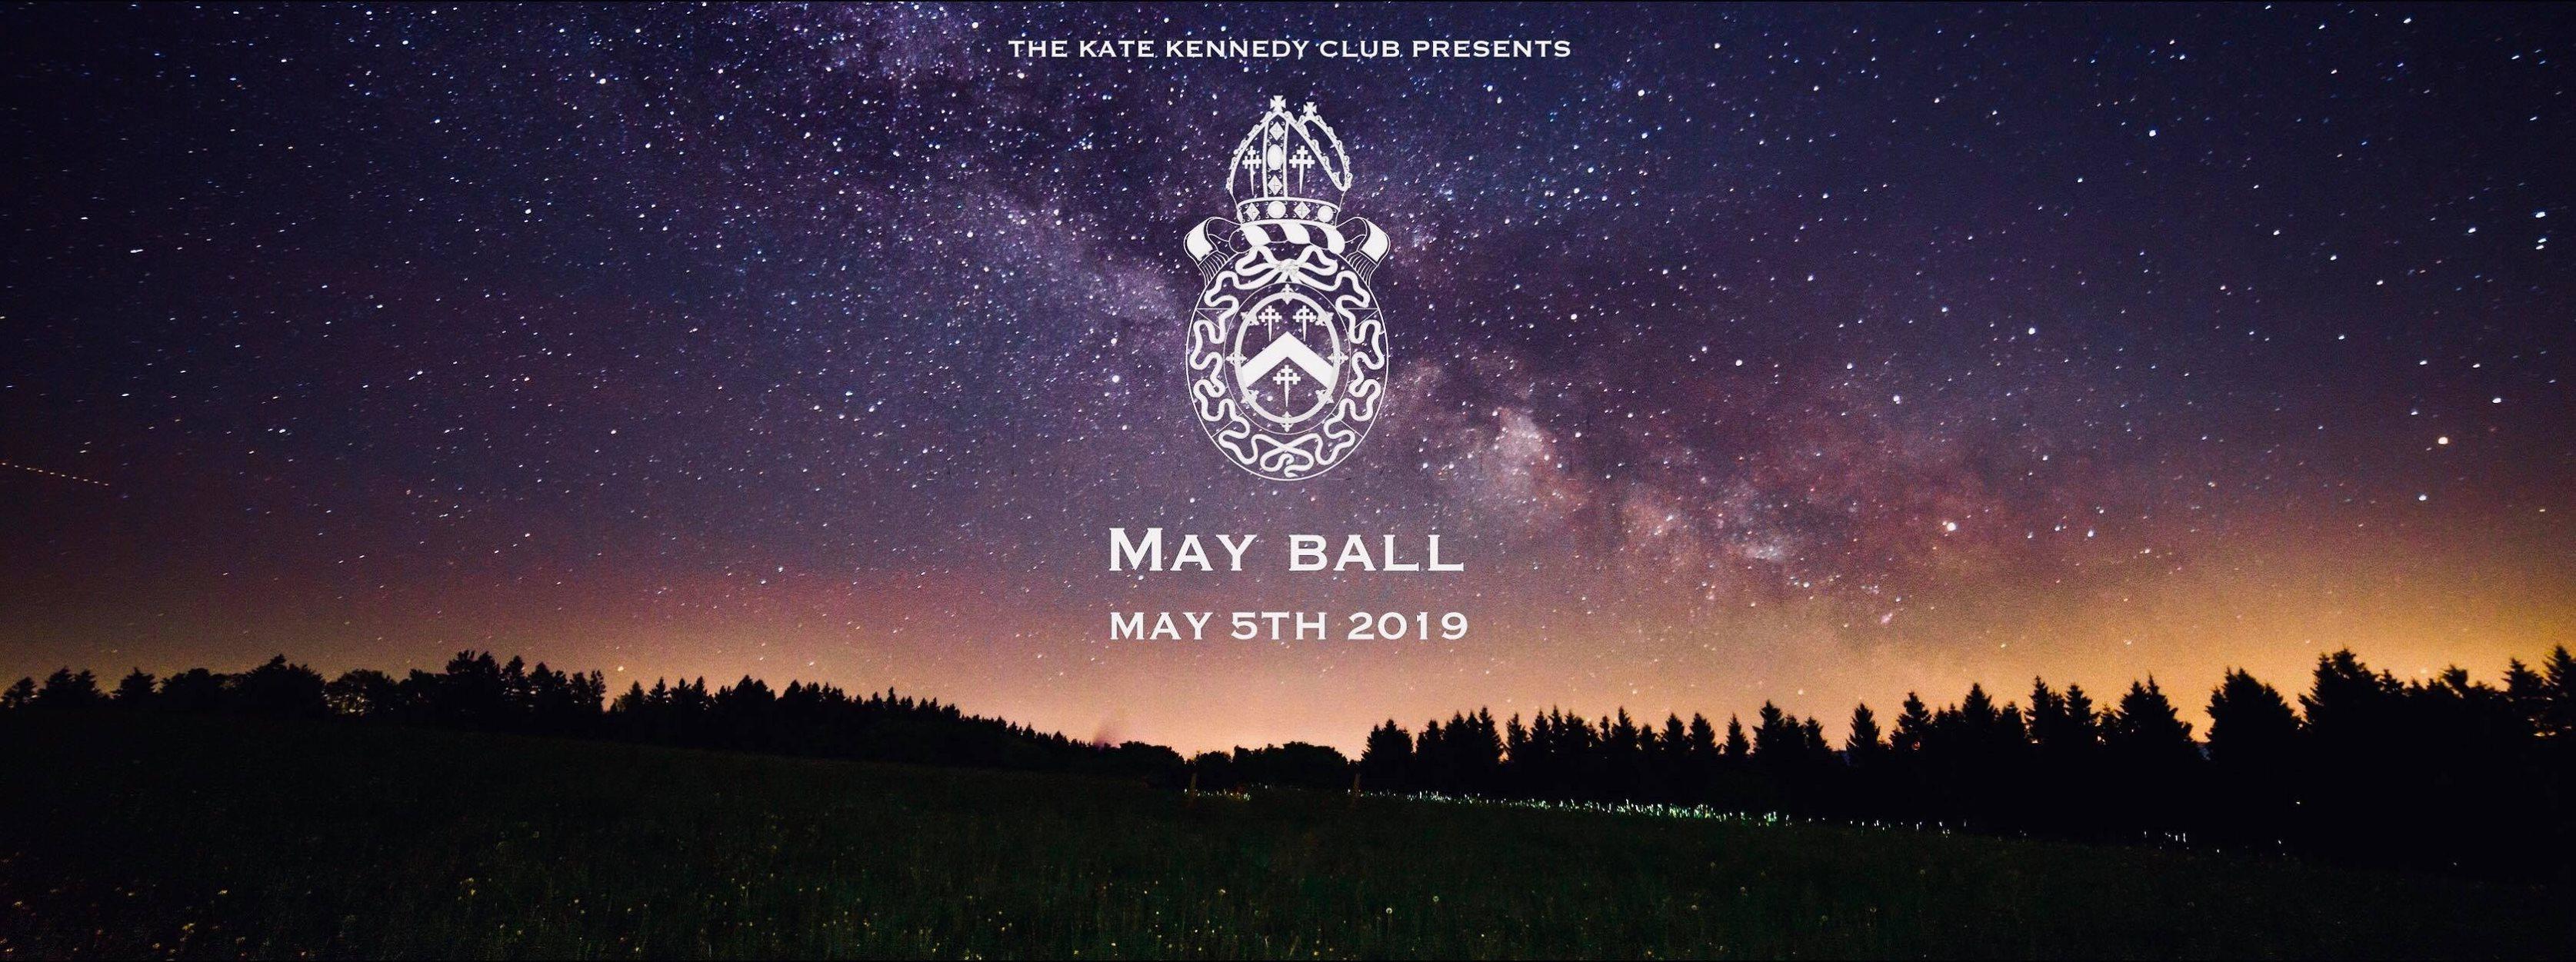 May Ball 2019: Previewed